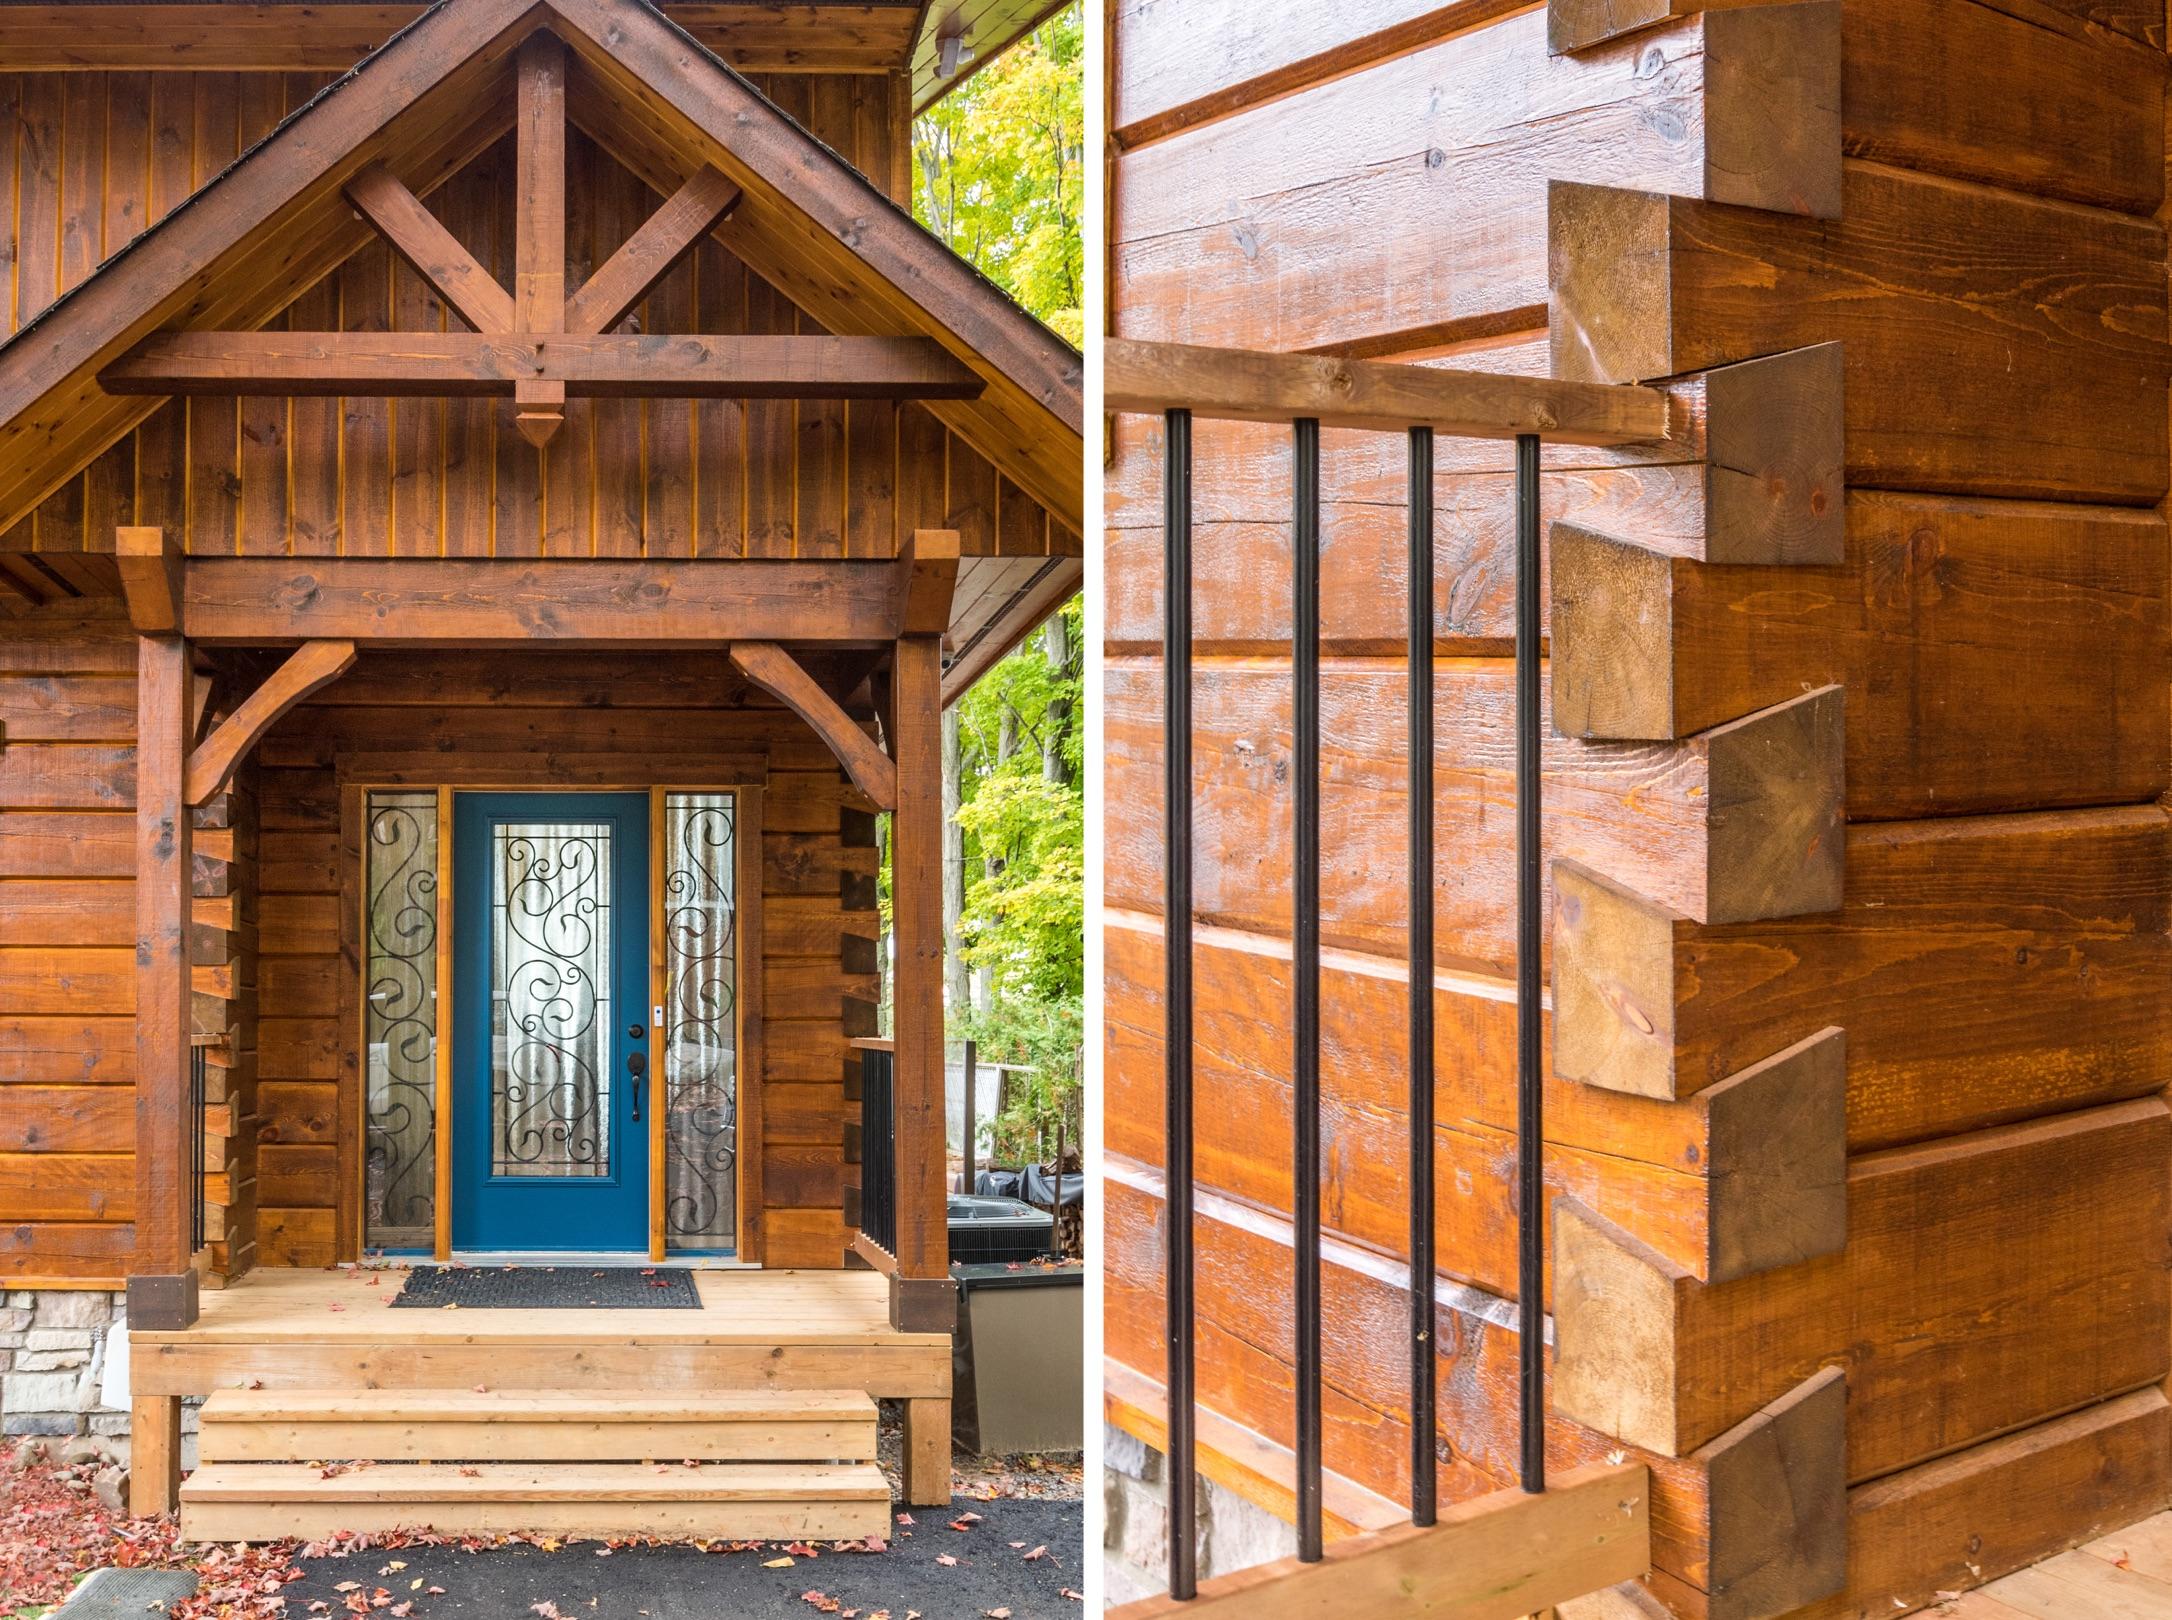 Baksh-exterior-detail.jpg